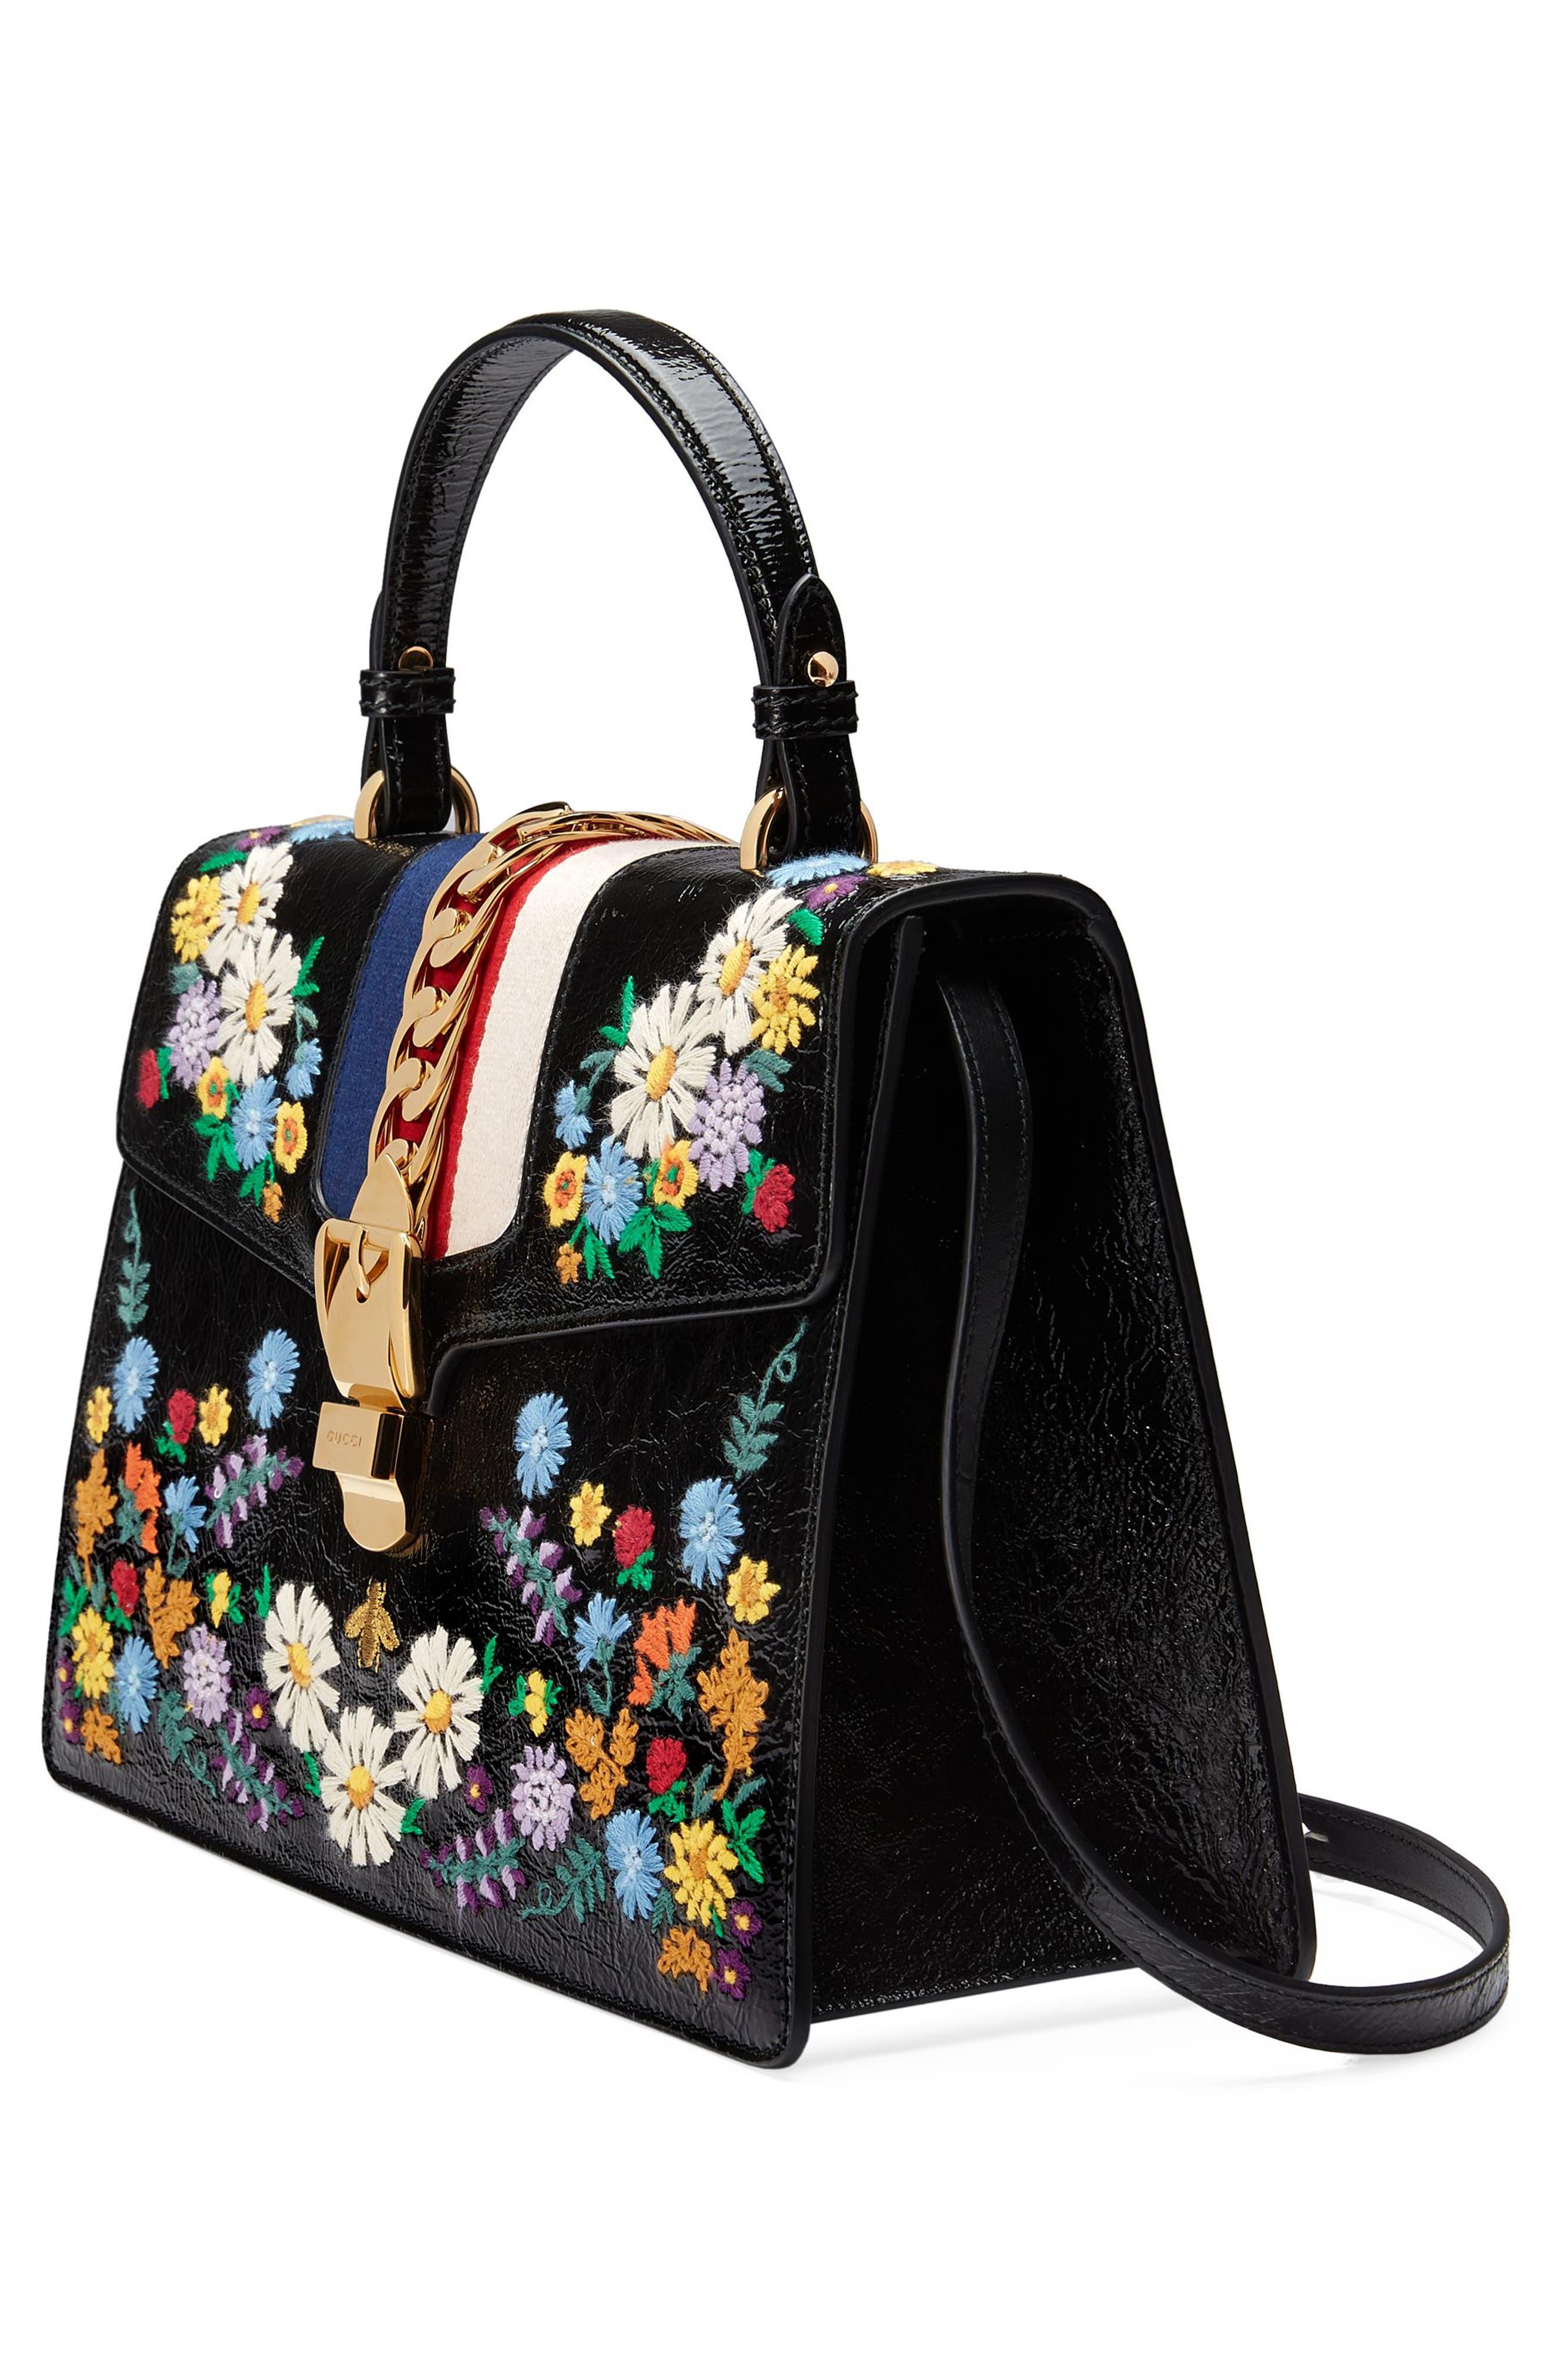 Medium Sylvie Floral Embroidered Top Handle Leather Shoulder Bag,                             Alternate thumbnail 4, color,                             Nero Multi